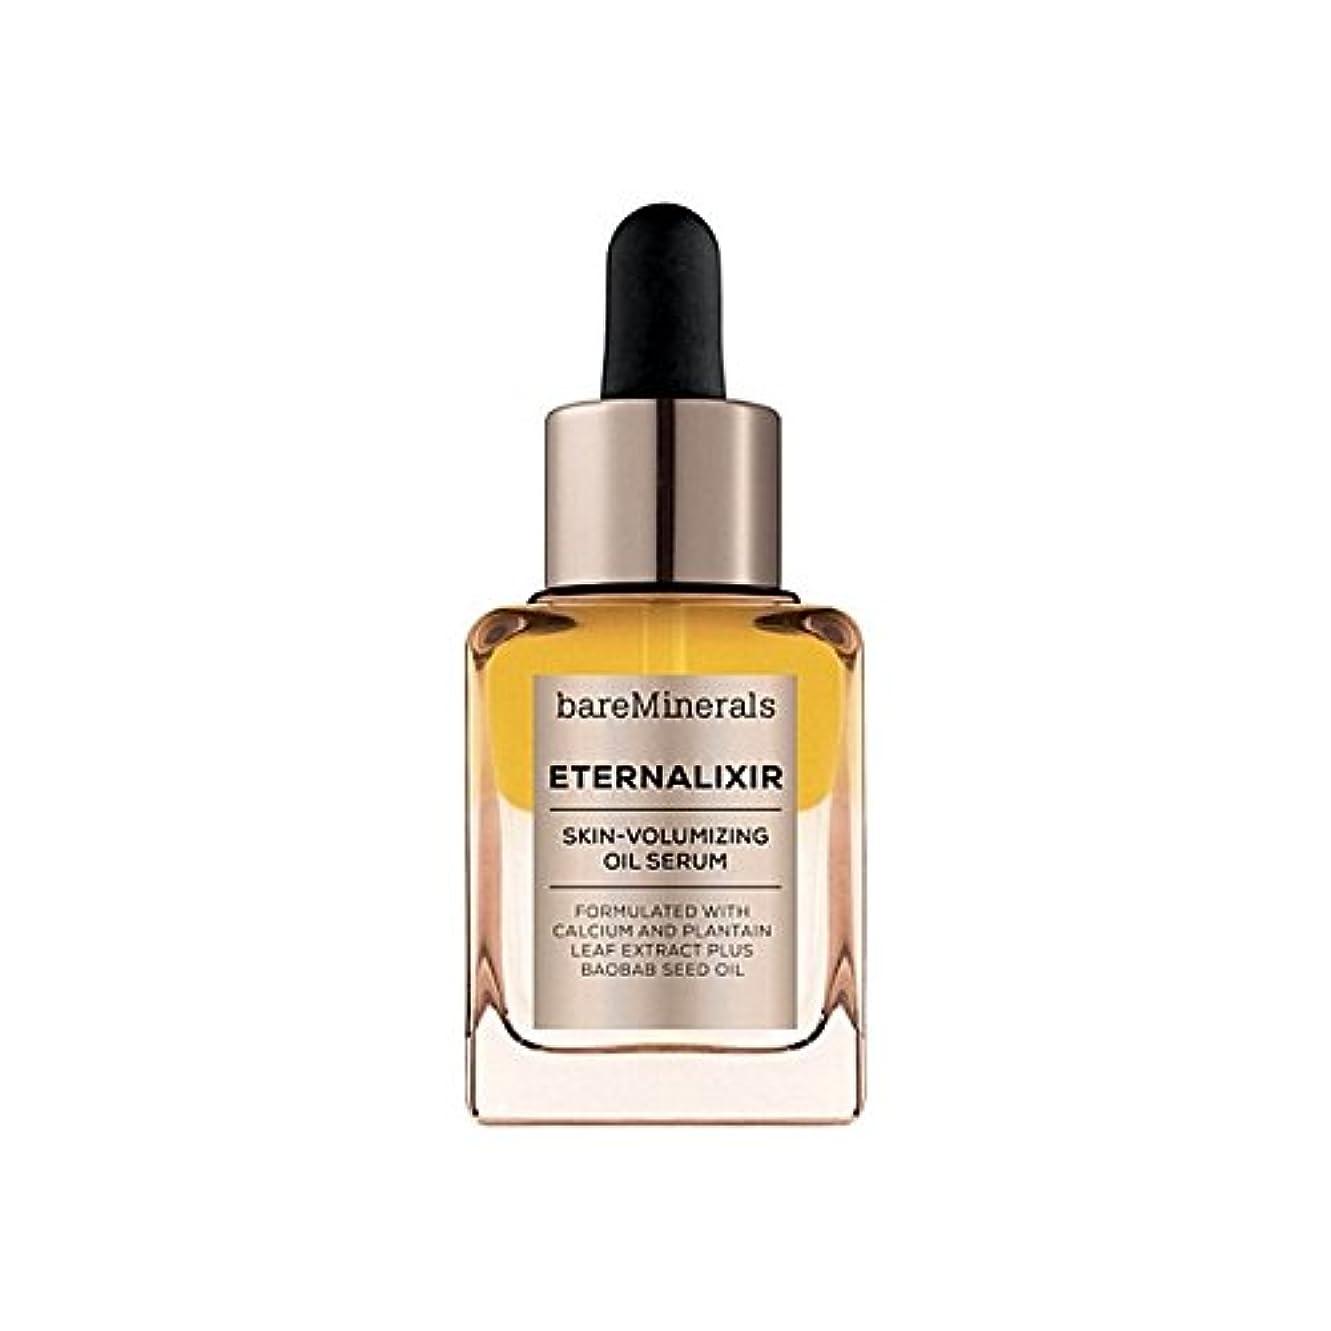 Bare Minerals Externalixir Skin Volumising Oil Serum 30Ml - ベアミネラル皮膚オイルセラム30 [並行輸入品]